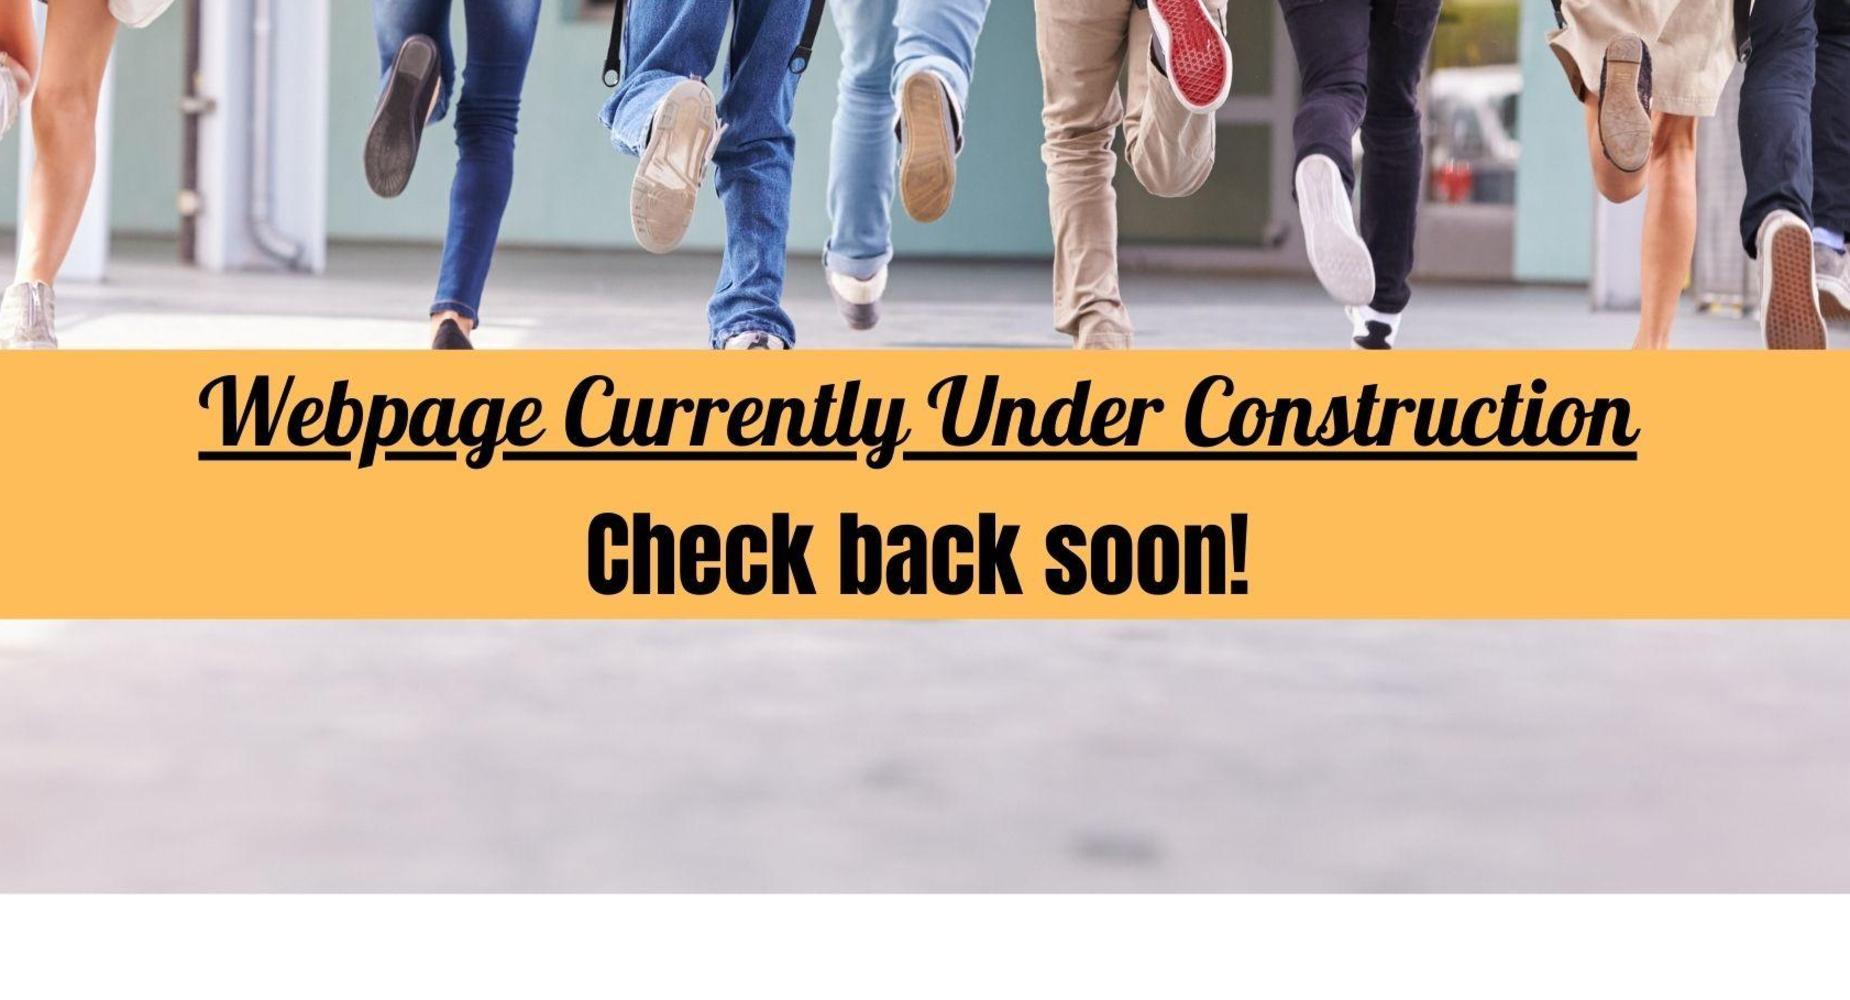 Webpage Under Construction